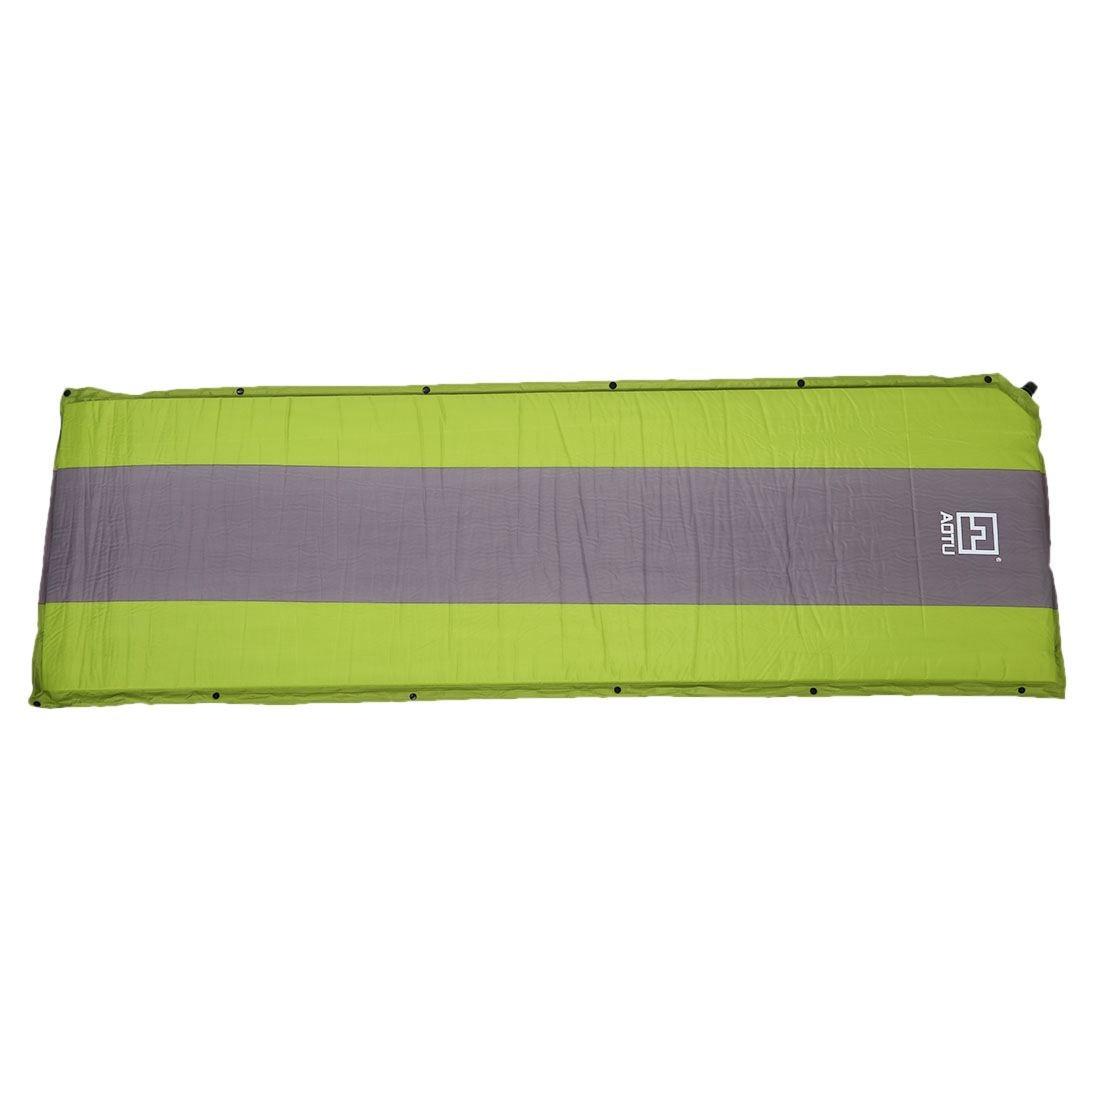 AOTU Self Inflating sponge Sleeping Mat Camping Mattress Air Bed Single  Roll Up (green)